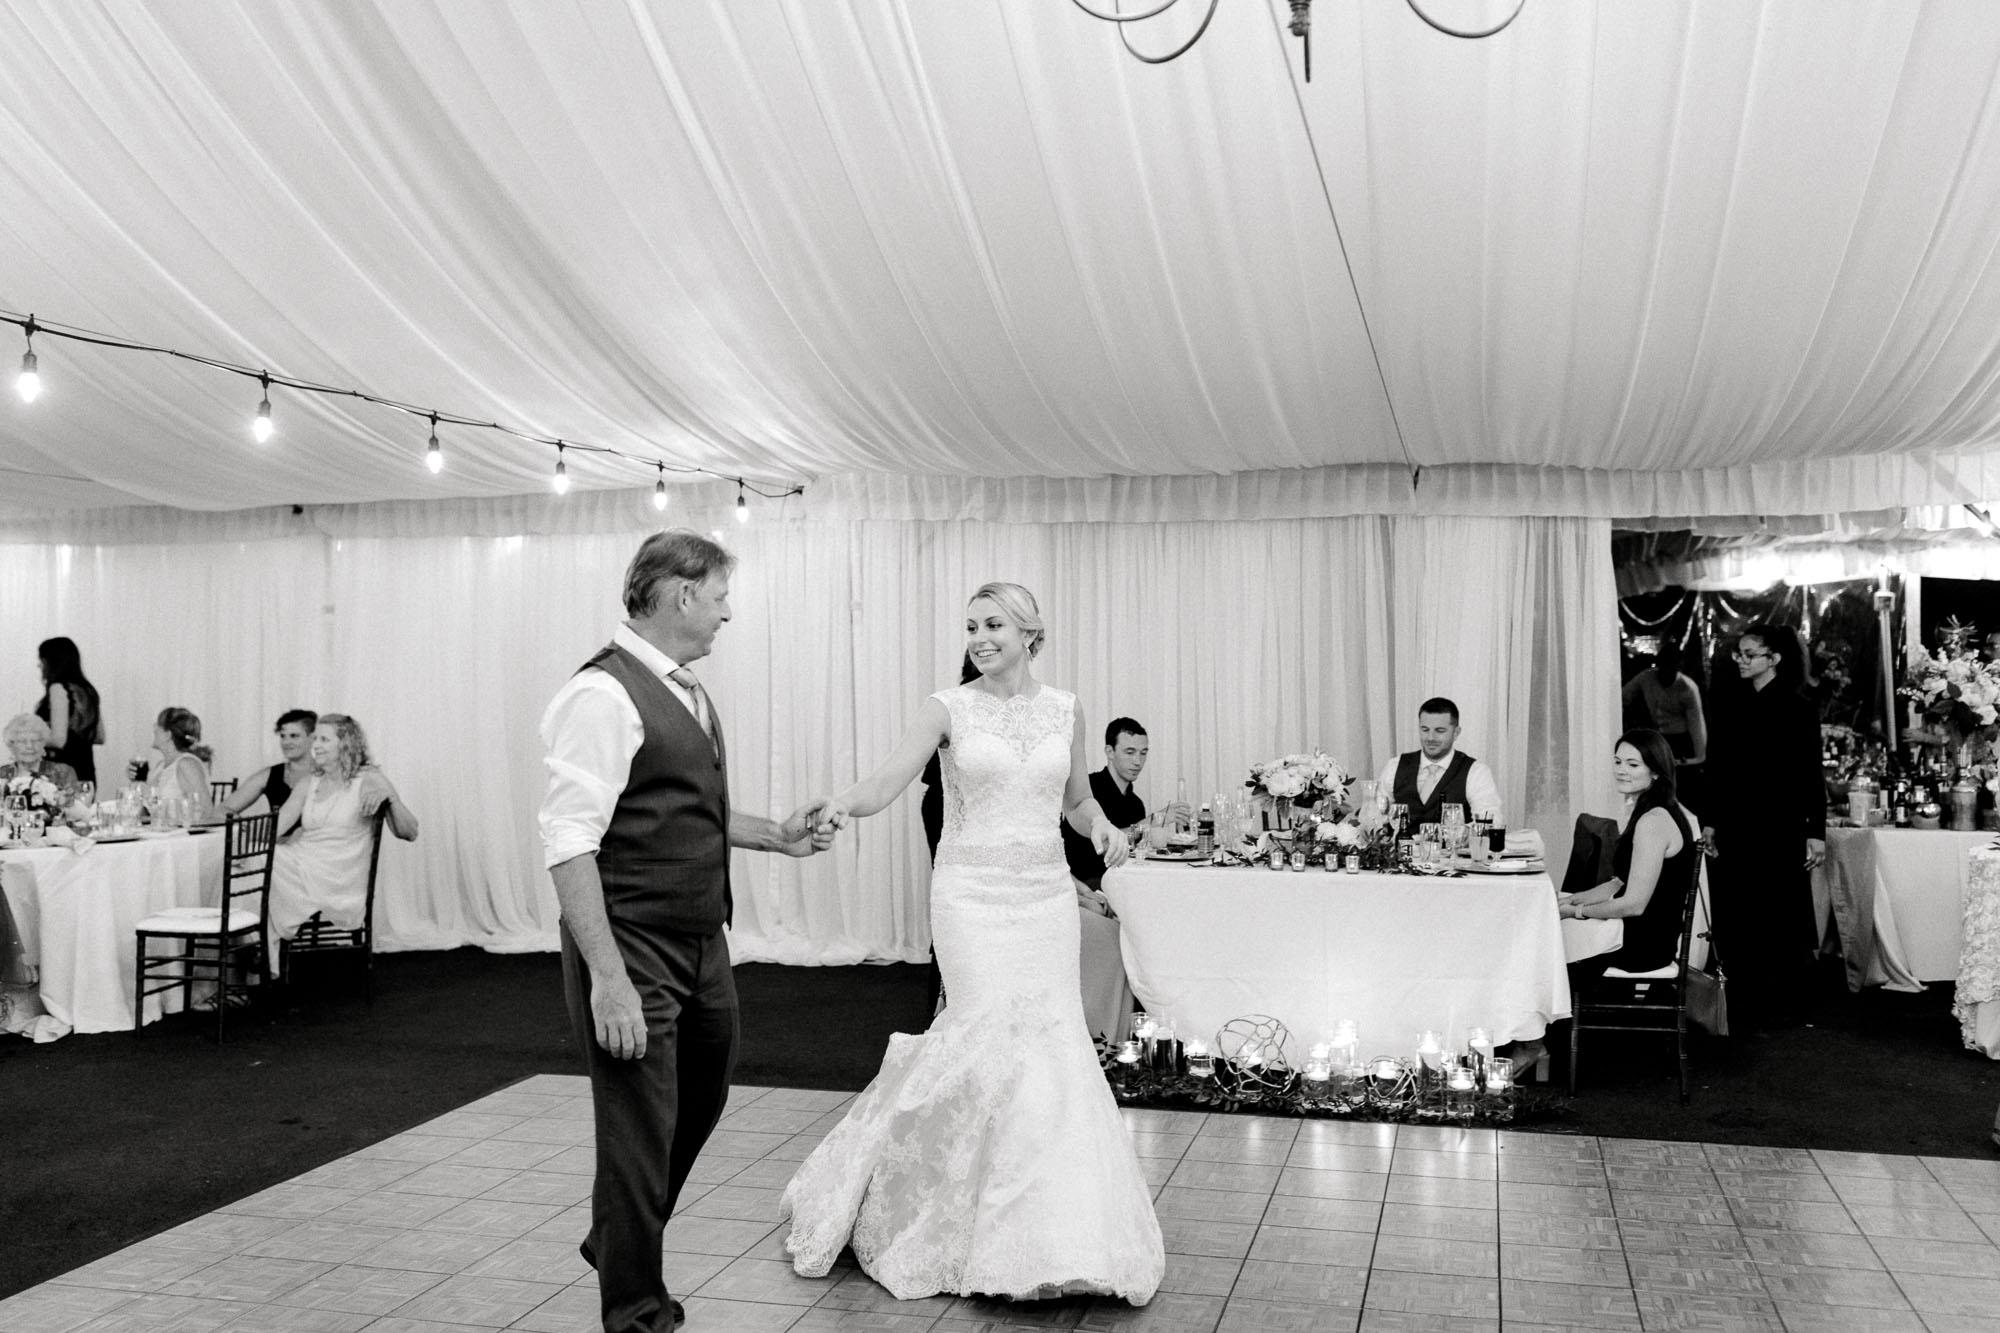 Allenberry-resort-historic-pennsylvania-wedding-10688.jpg